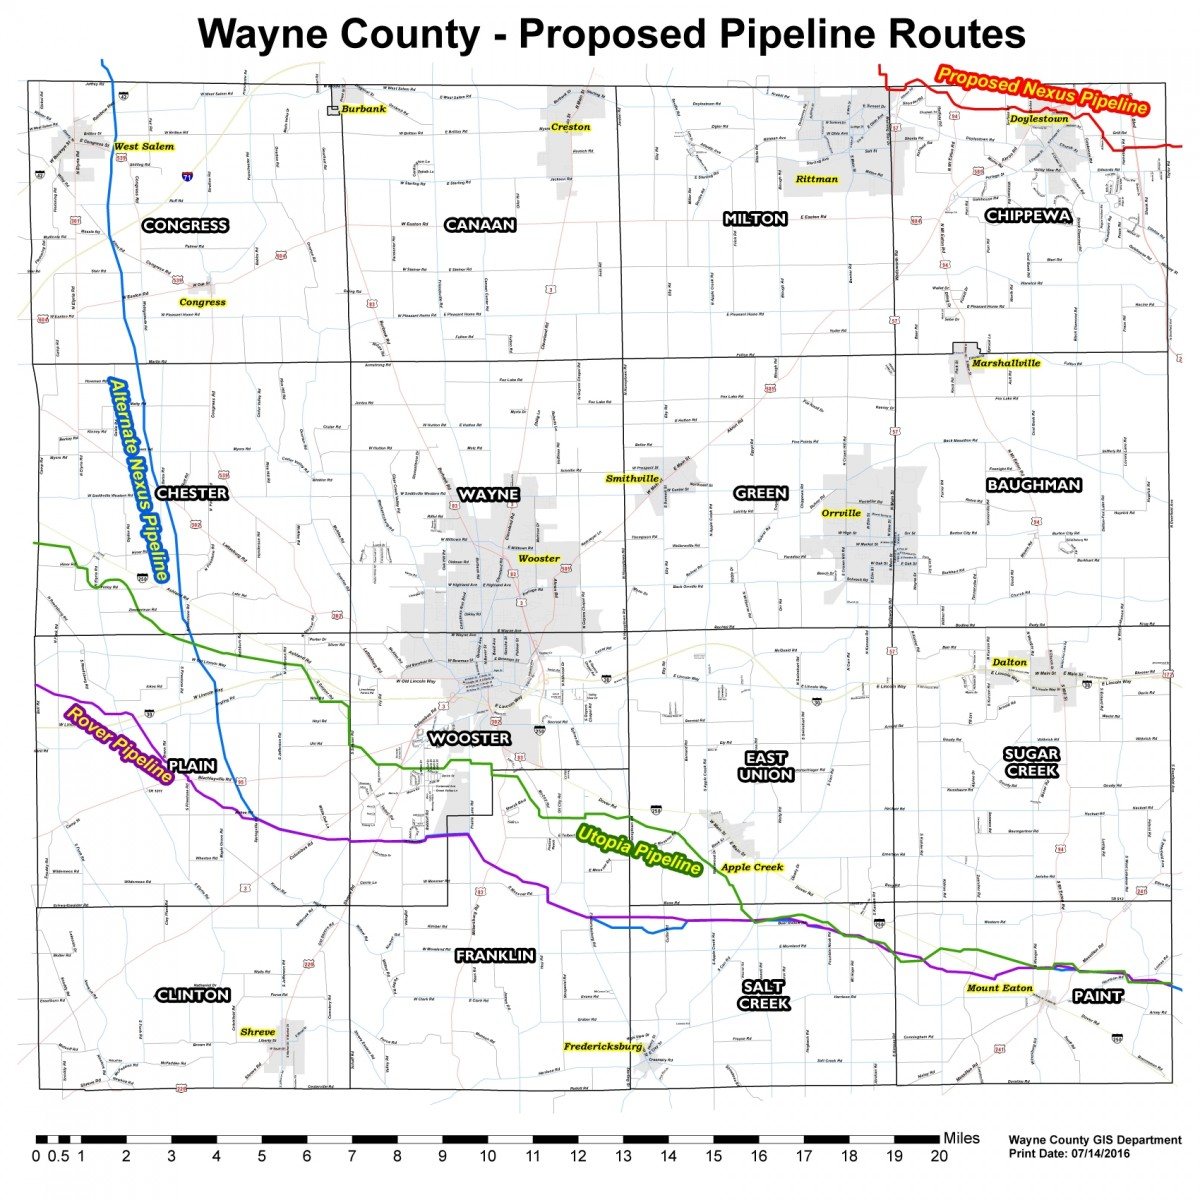 Wayne County Tax Maps NEXUS Information | Wayne County Ohio